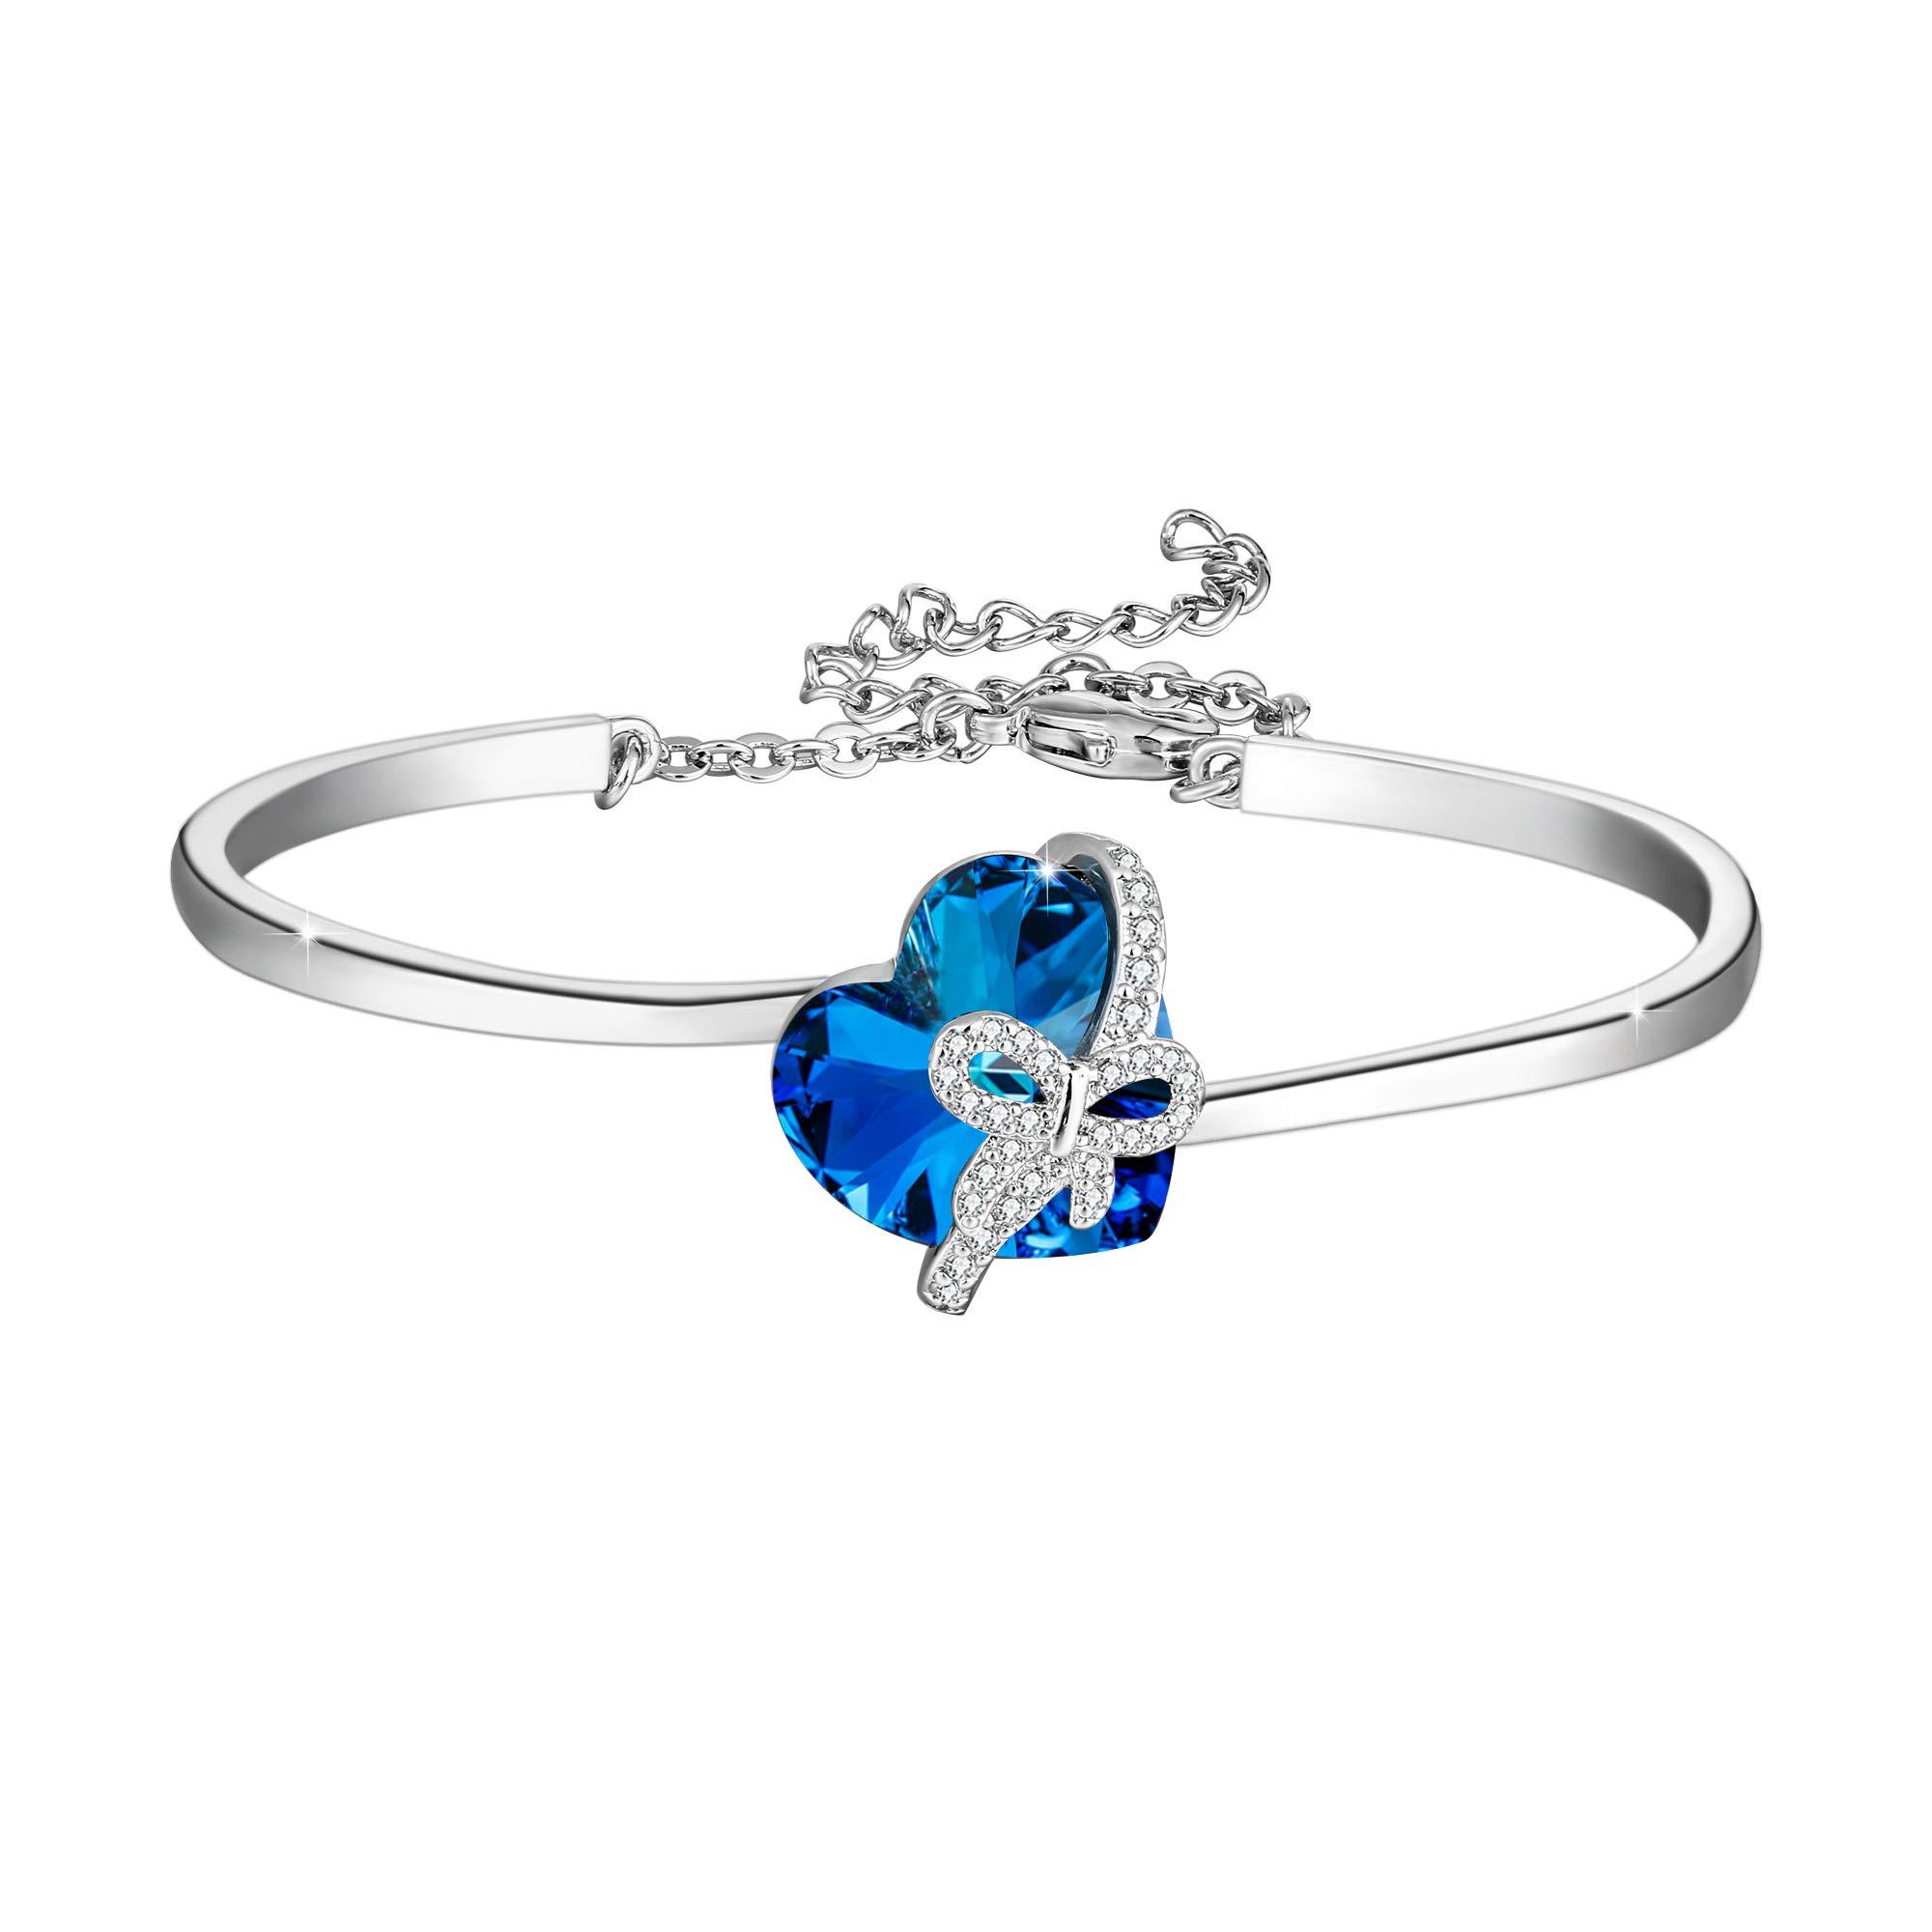 EleQueen Women's Swarovski Crystals Cubic Zirconia Butterfly Heart Pendant Bangle Bracelet Sapphire